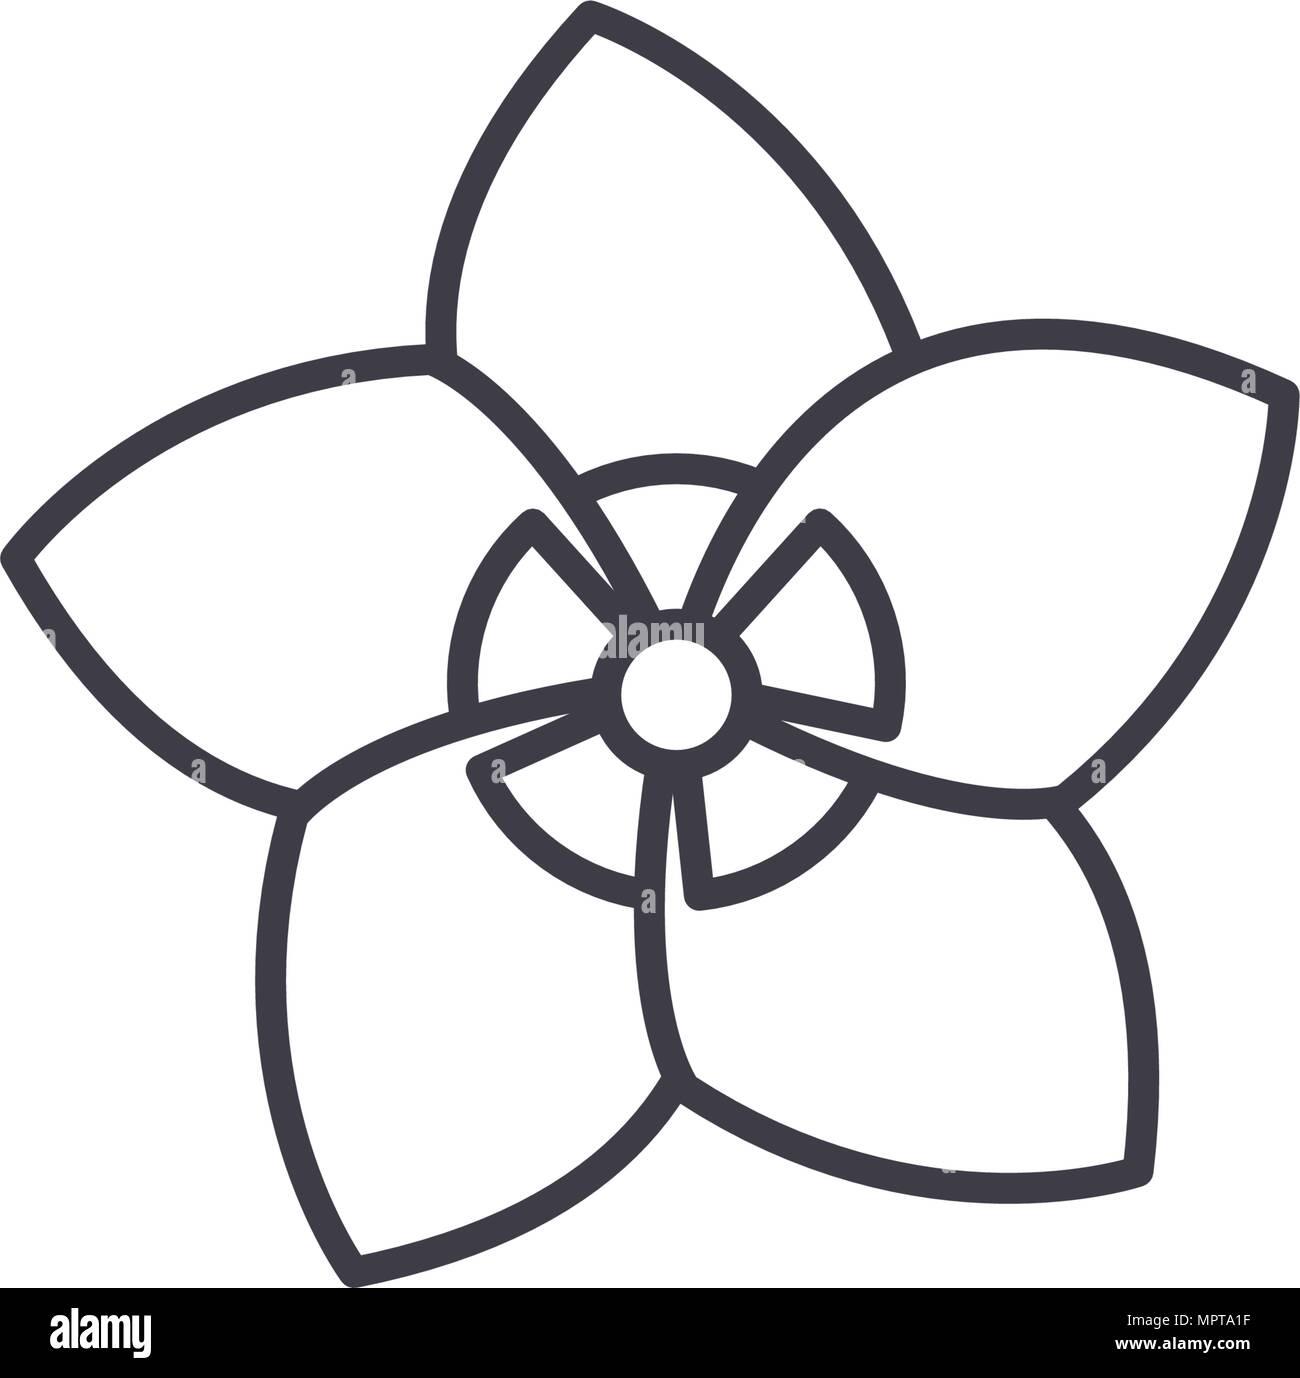 Jasmine Flower Line Icon Concept Jasmine Flower Flat Vector Sign